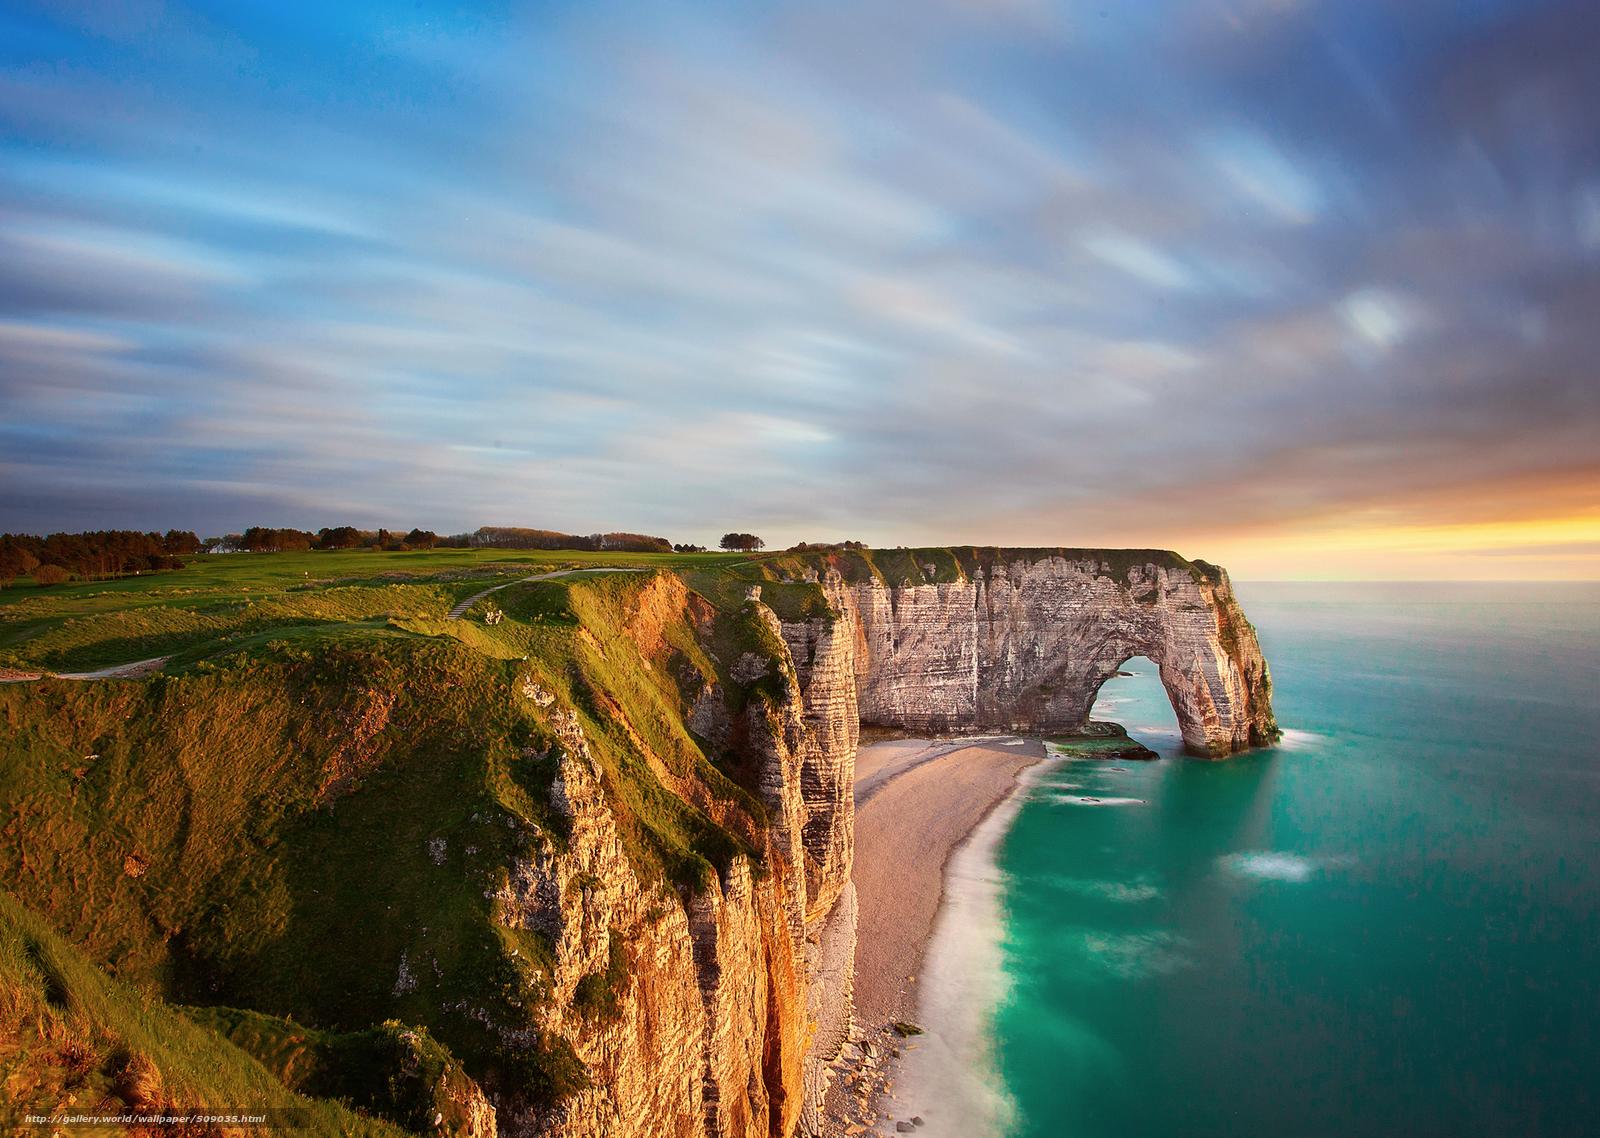 Frankreich Normandie Strand Felsen Bogen Meer Abend 509035